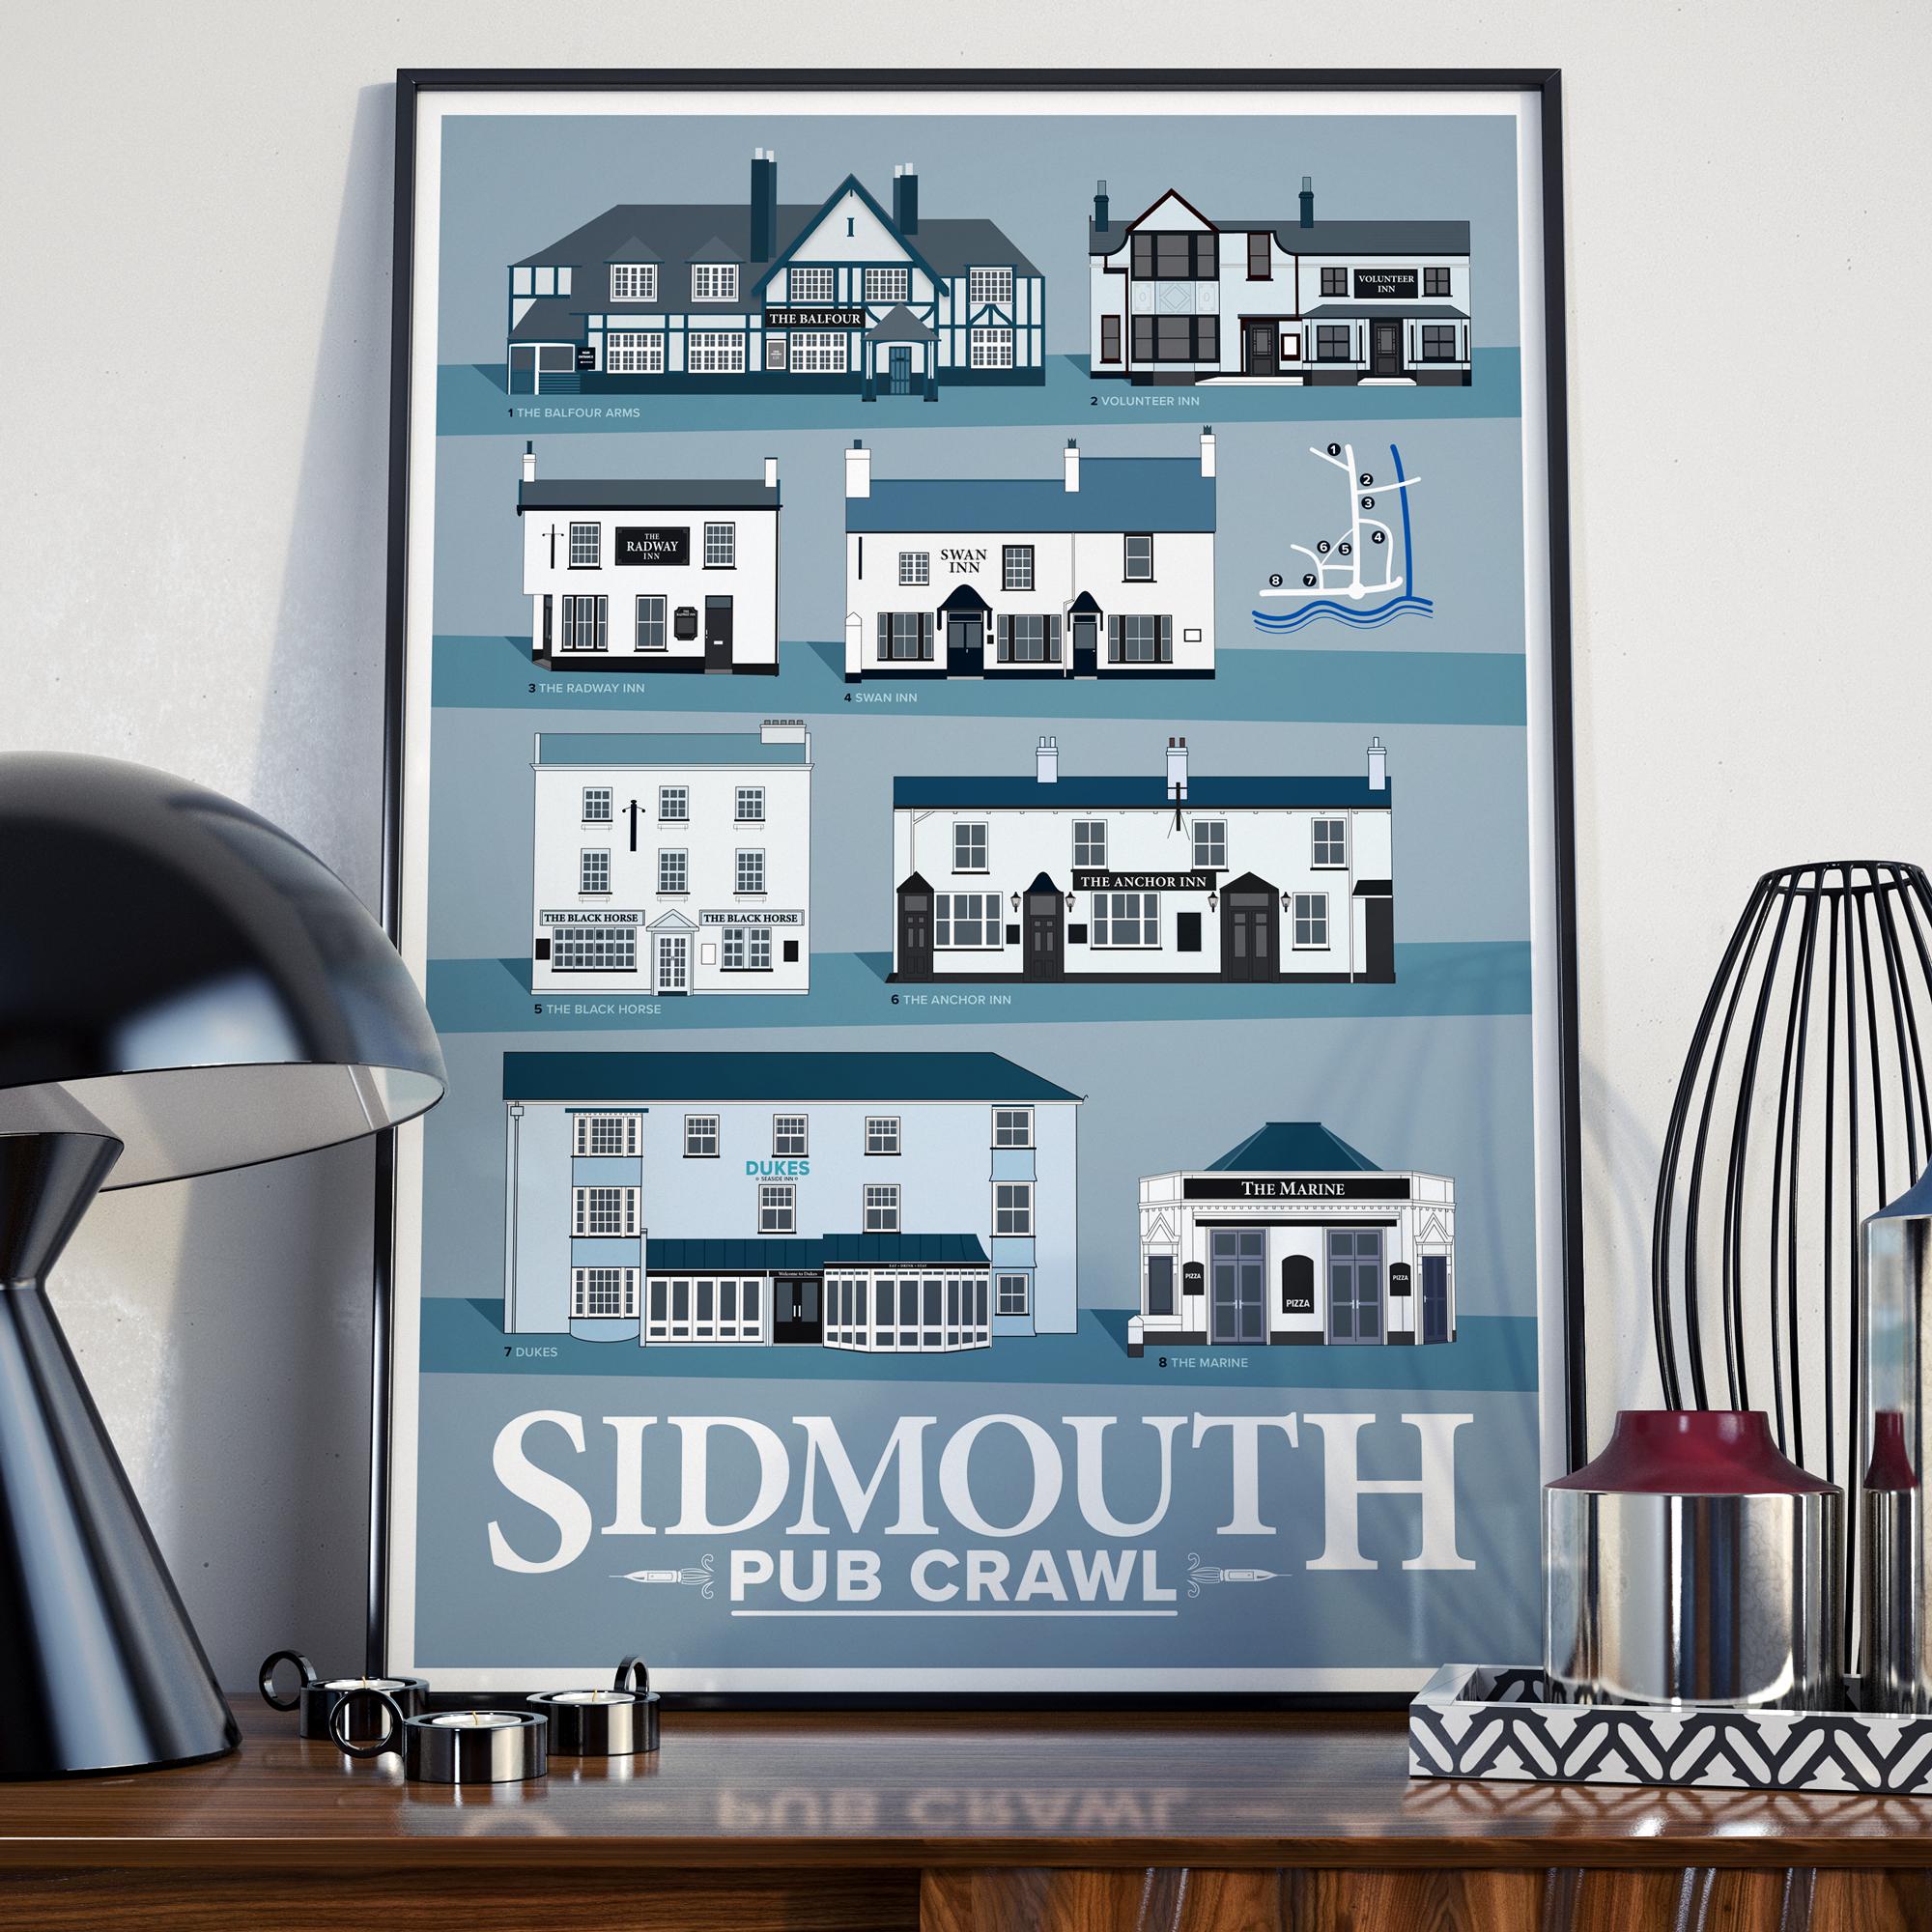 Sidmouth Pub Crawl Black Frame